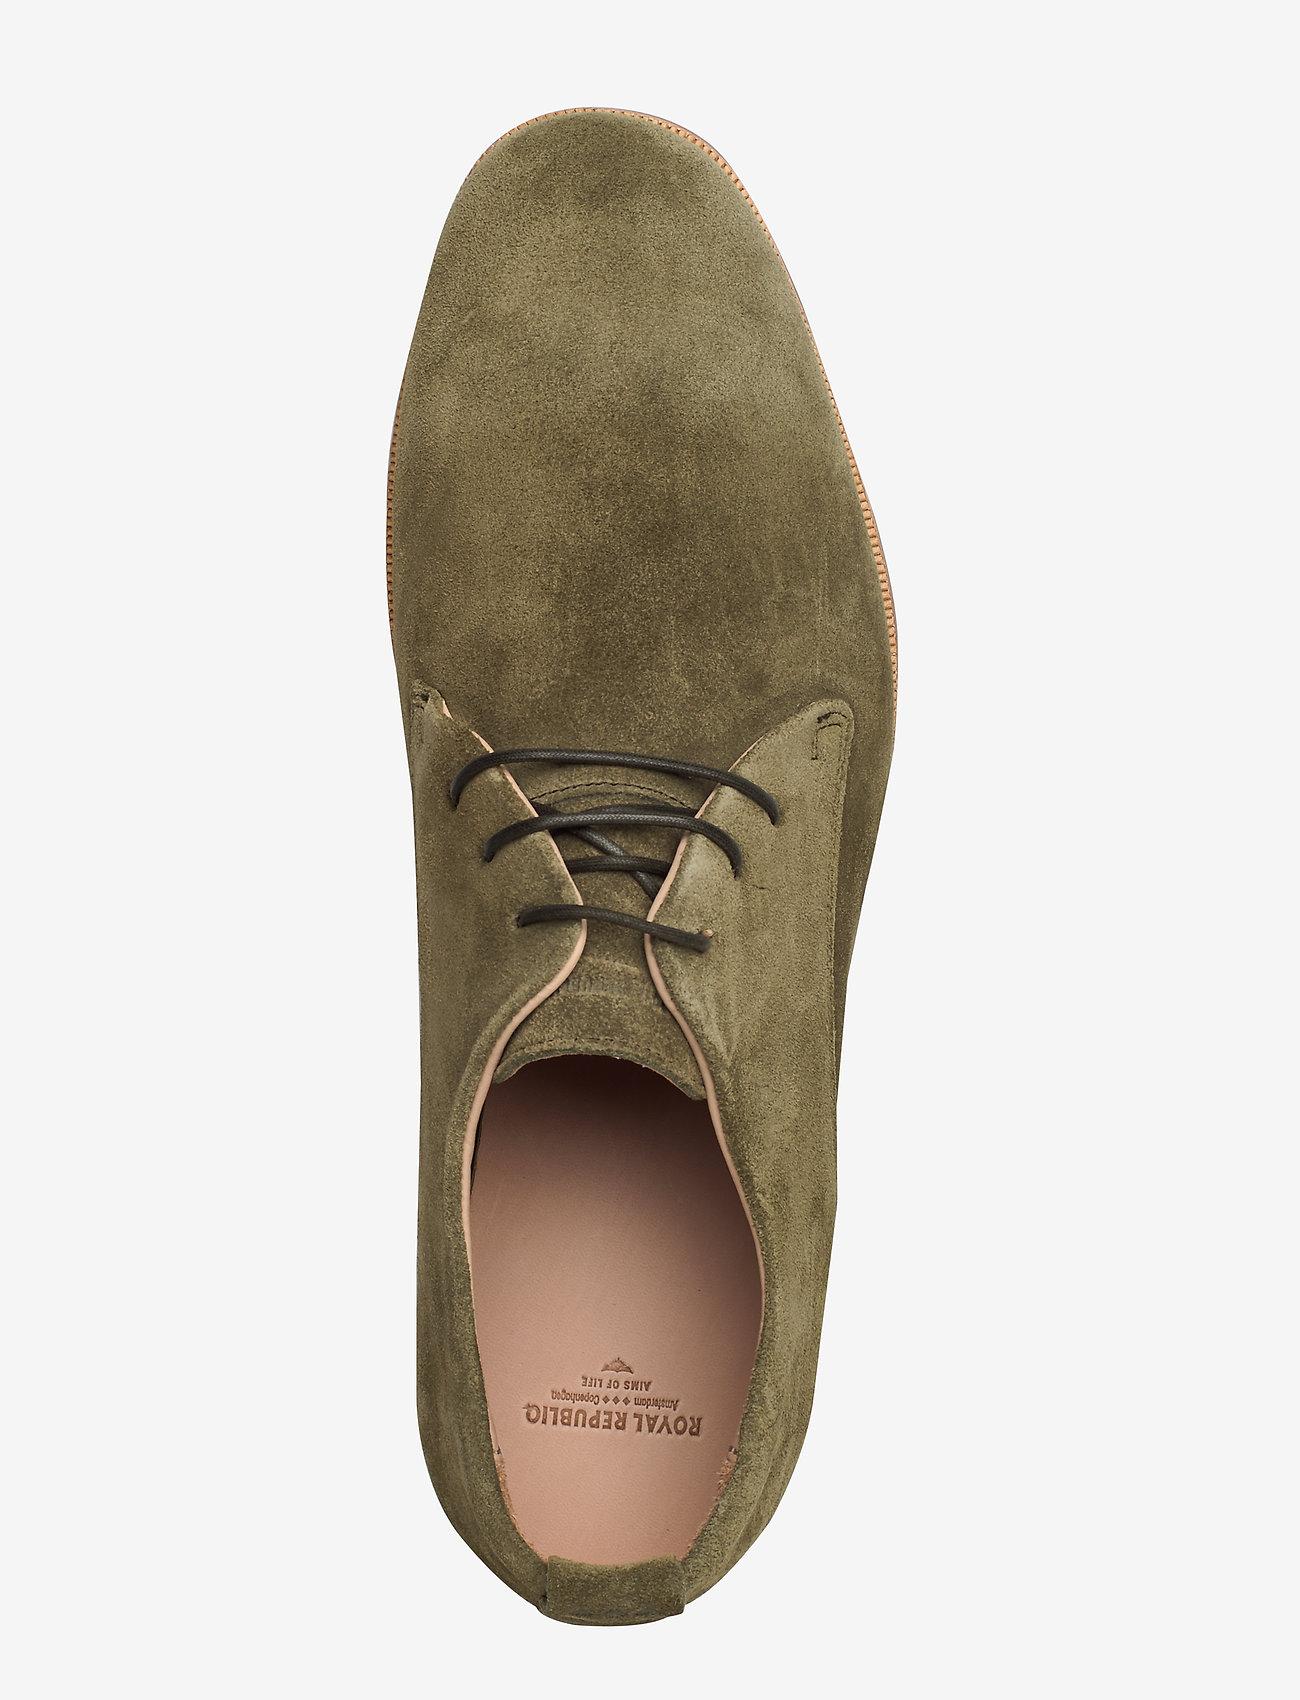 Royal RepubliQ Evo Suede Derby Shoe - Business OLIVE - Schuhe Billige